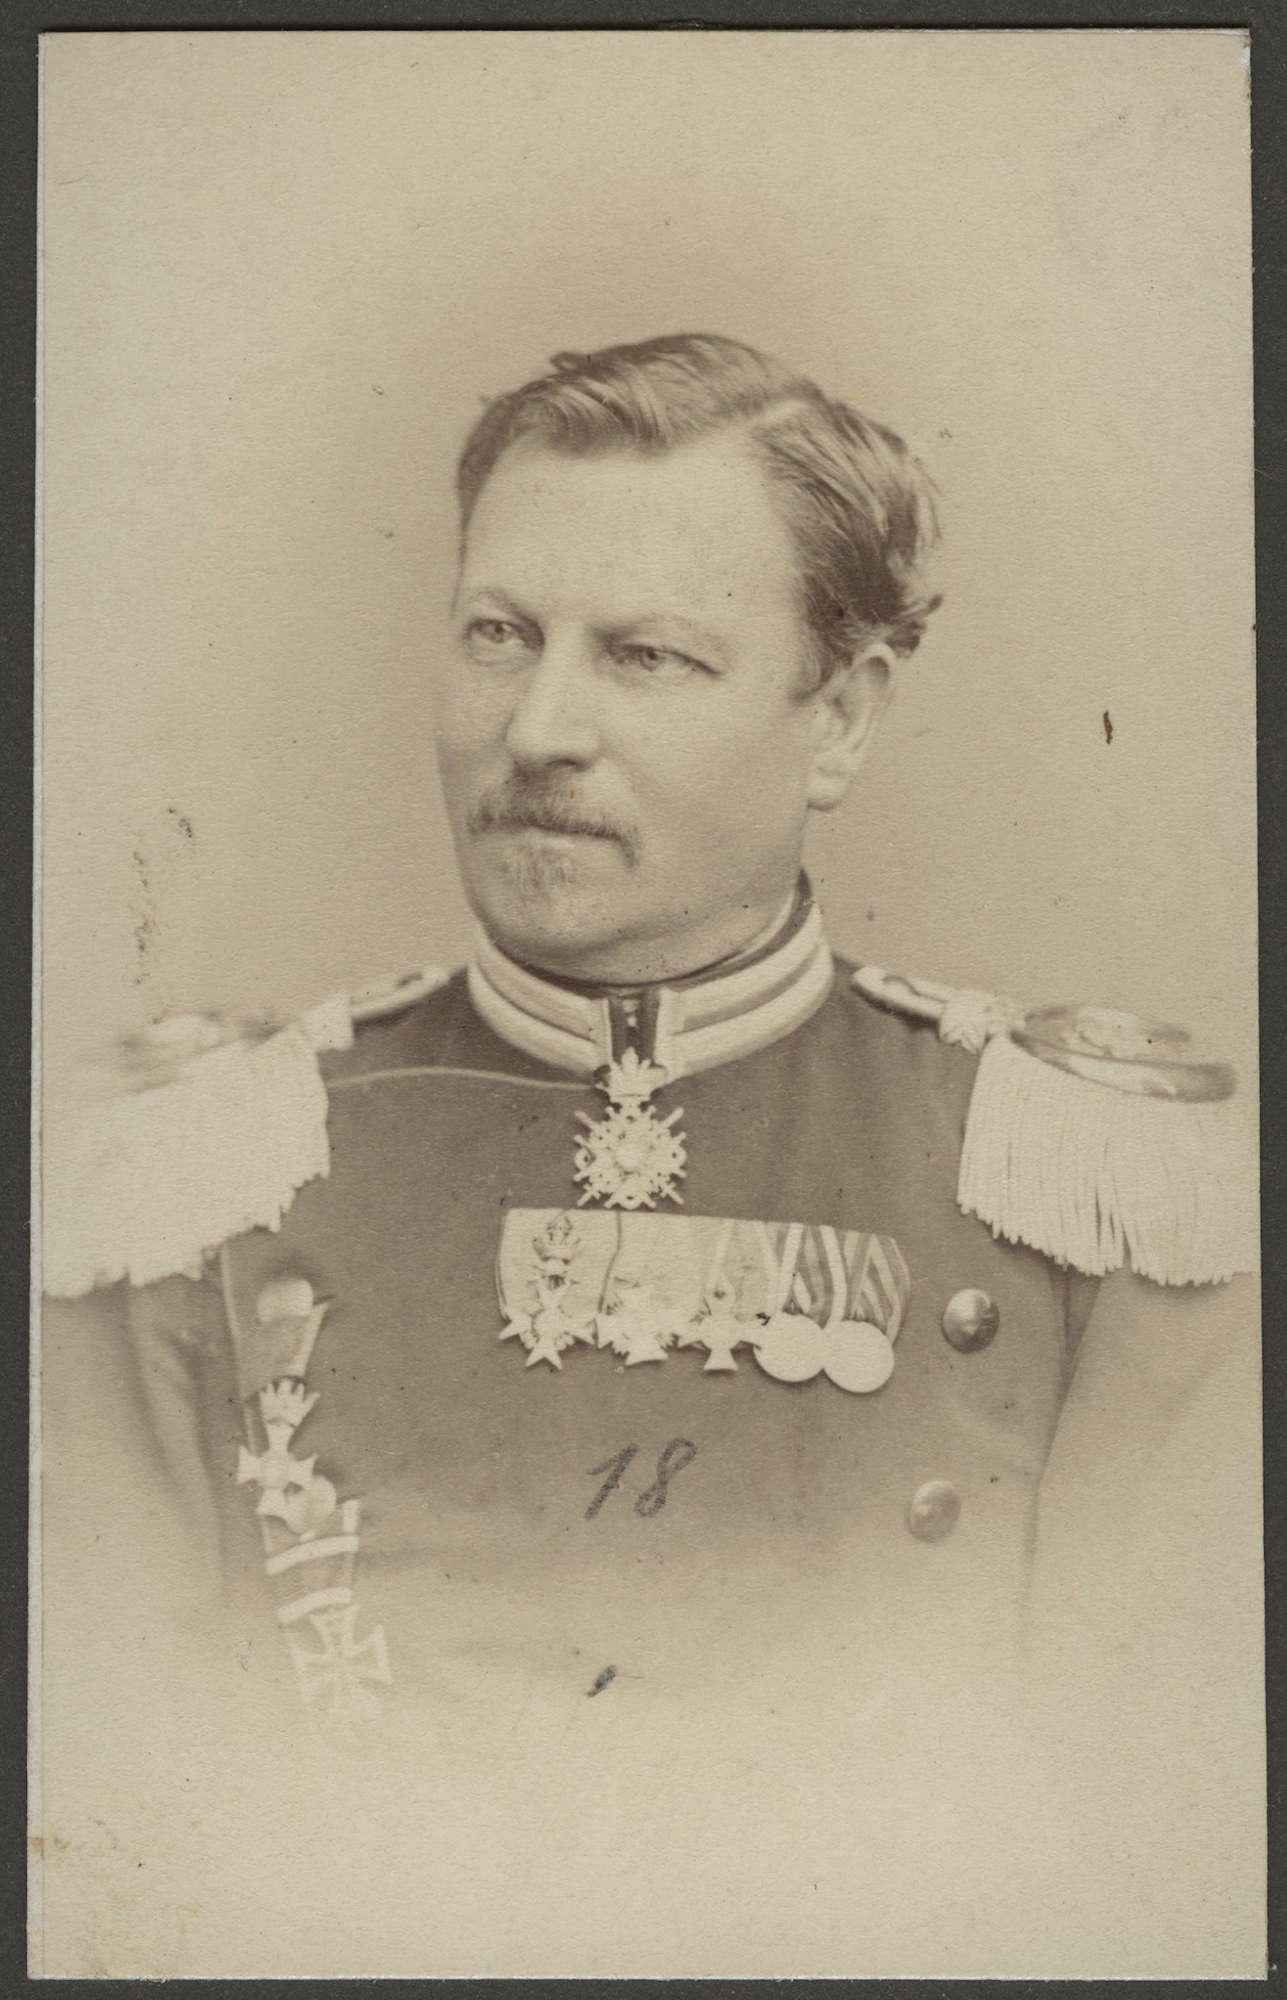 Drescher, Egmont, Bild 1